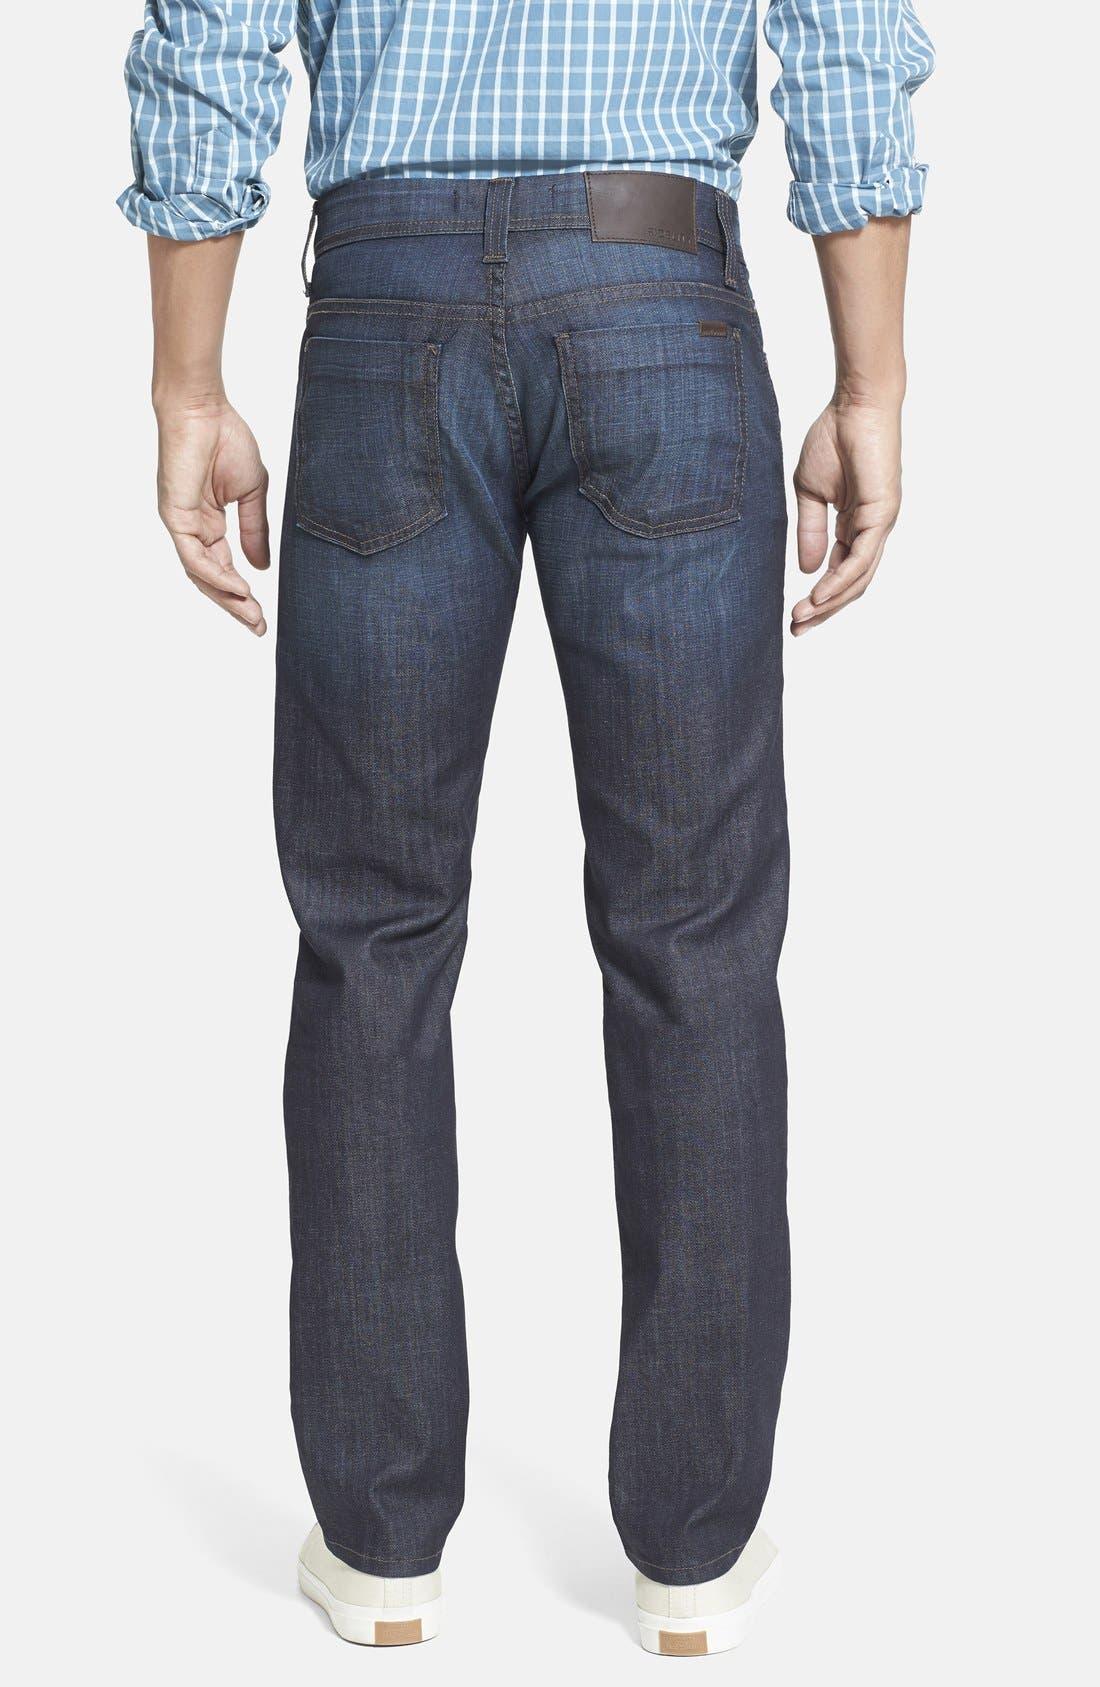 'Jimmy' Slim Straight Leg Jeans,                             Alternate thumbnail 2, color,                             400